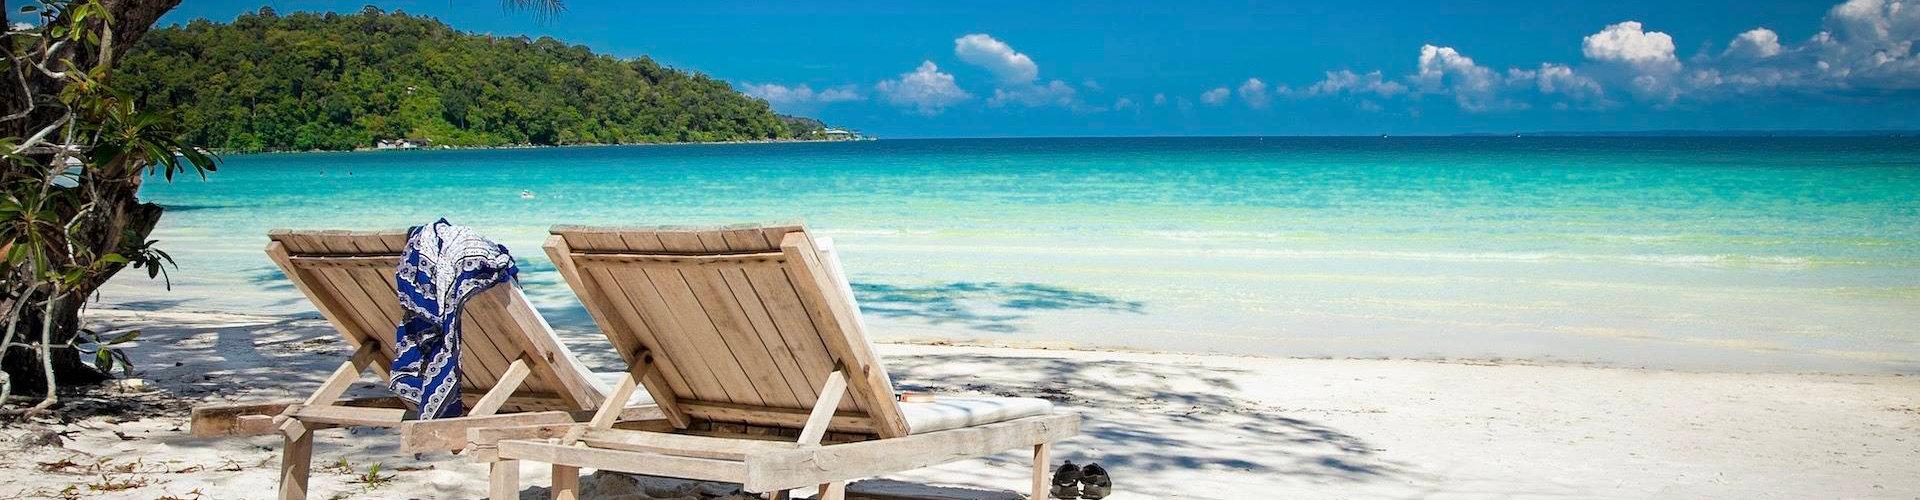 voyage cambodge plage